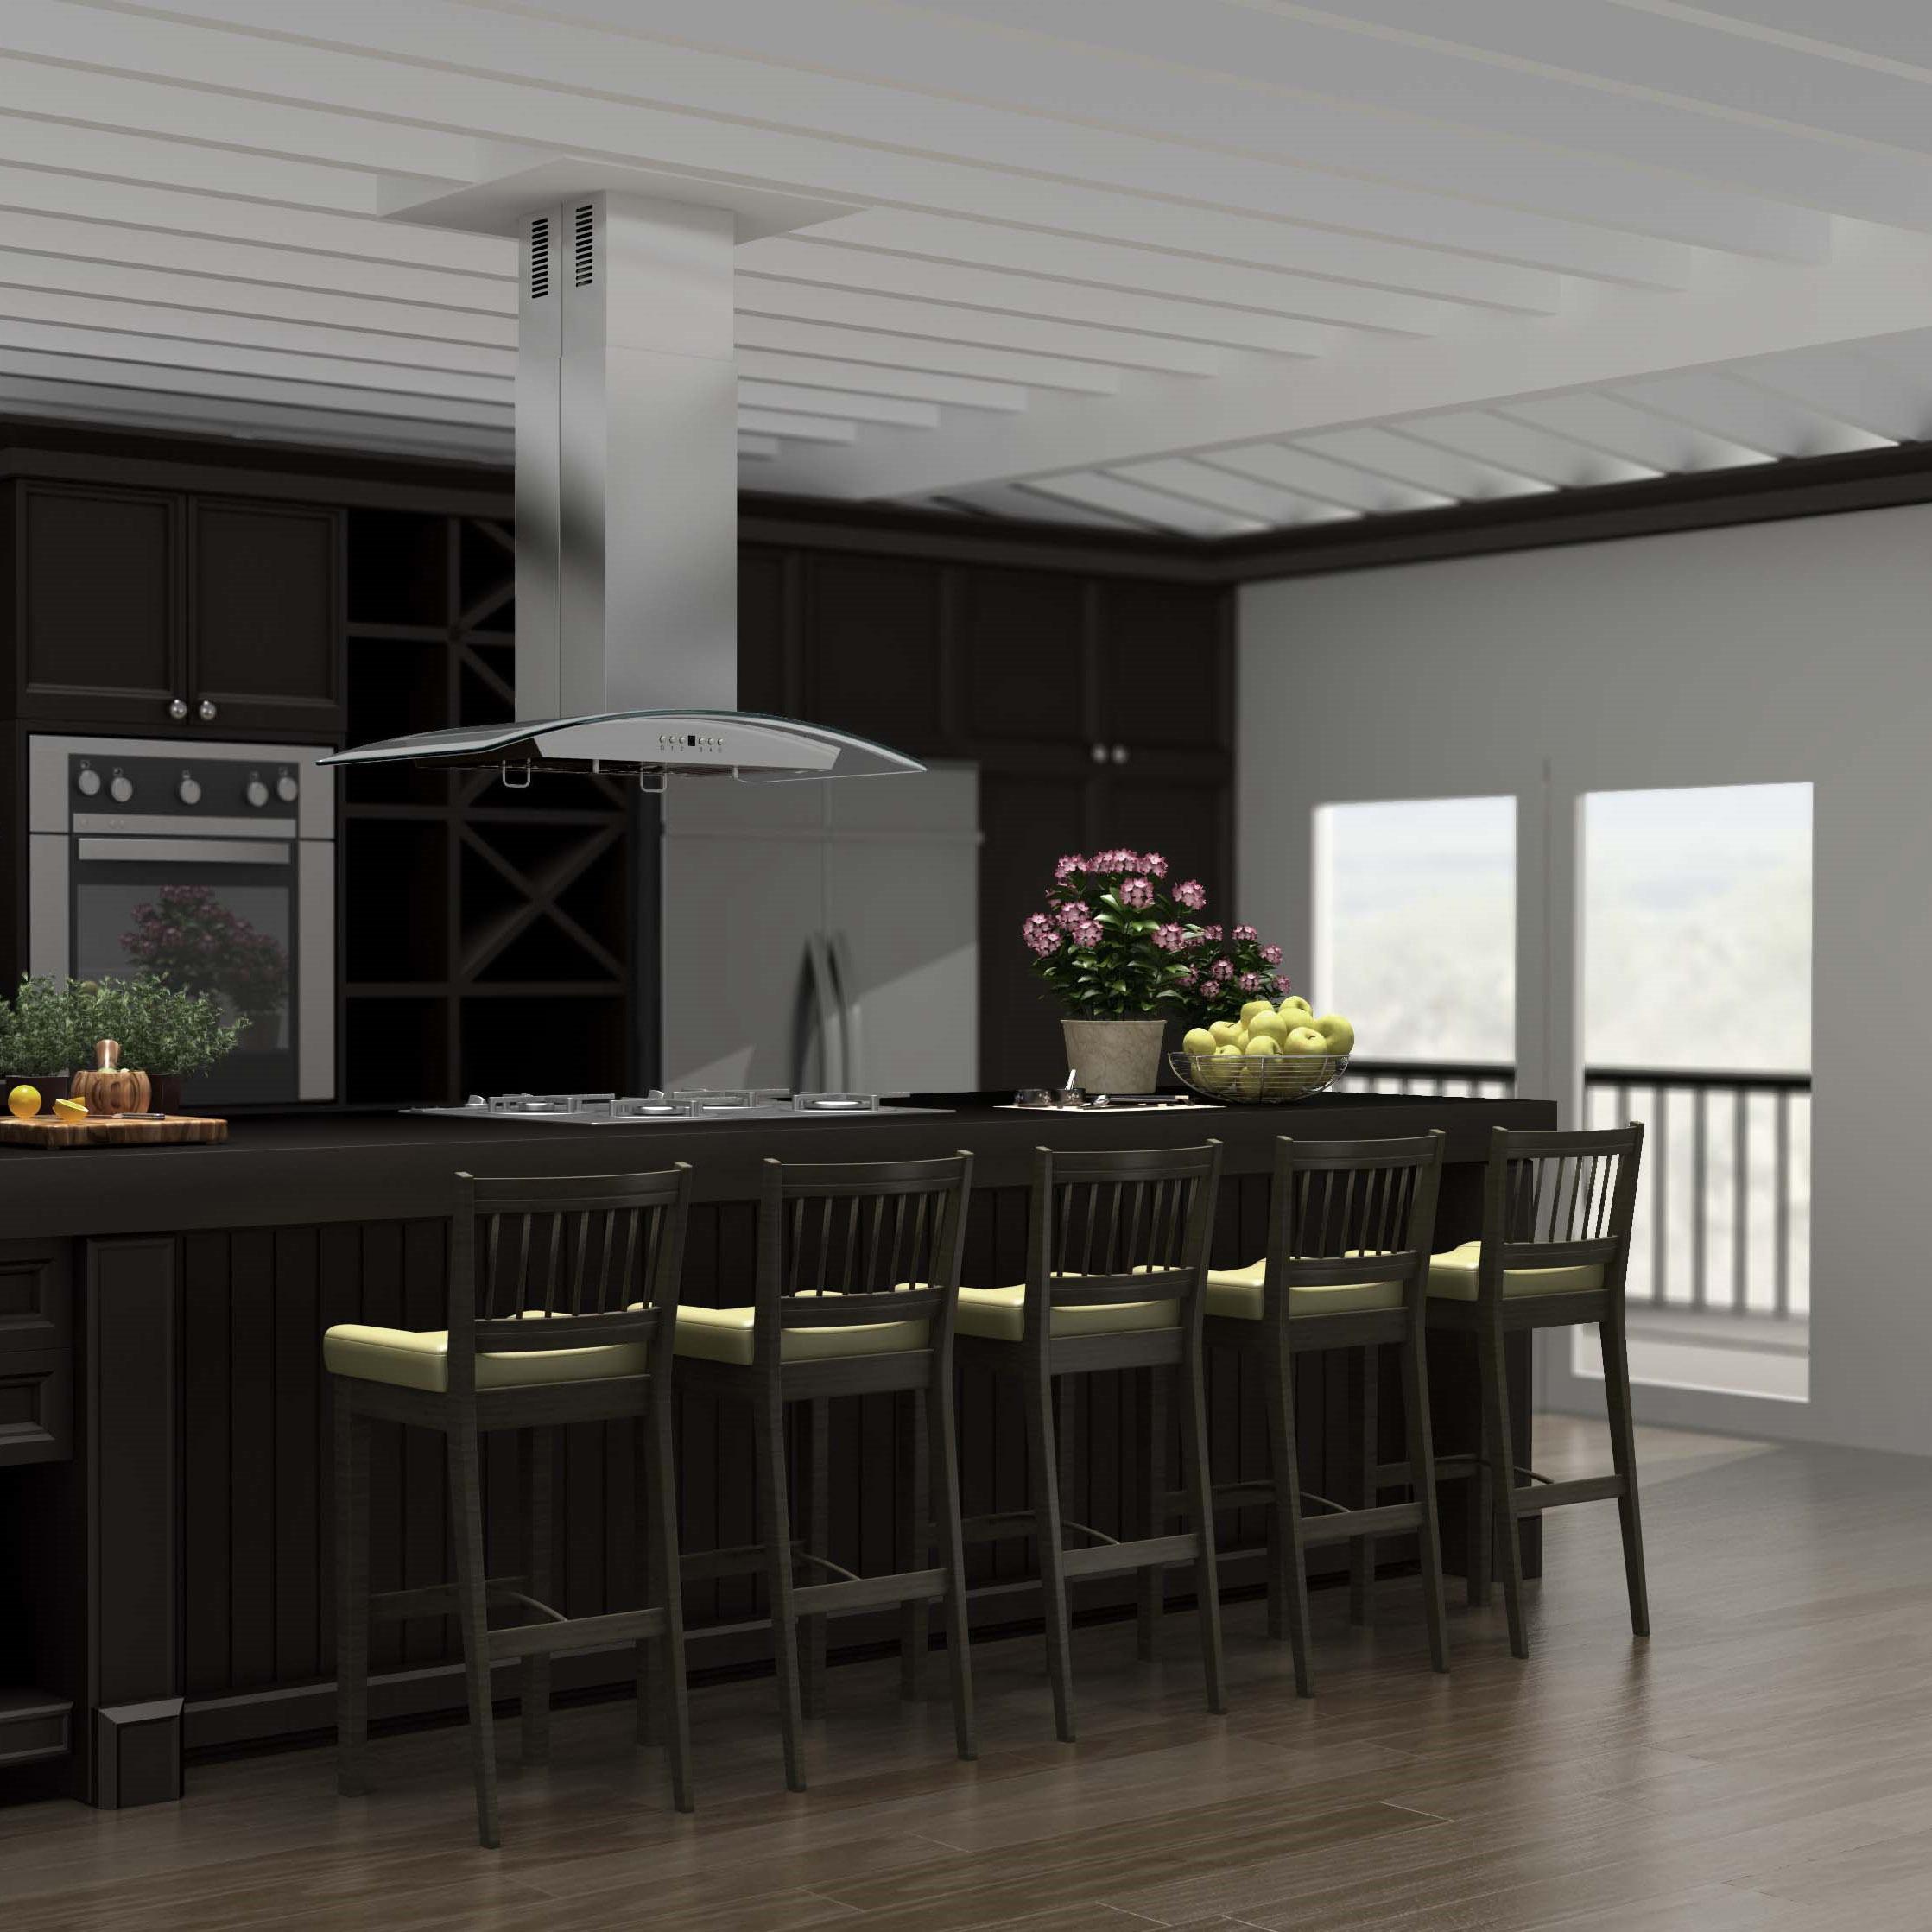 zline-stainless-steel-island-range-hood-GL5i-kitchen-far.jpg